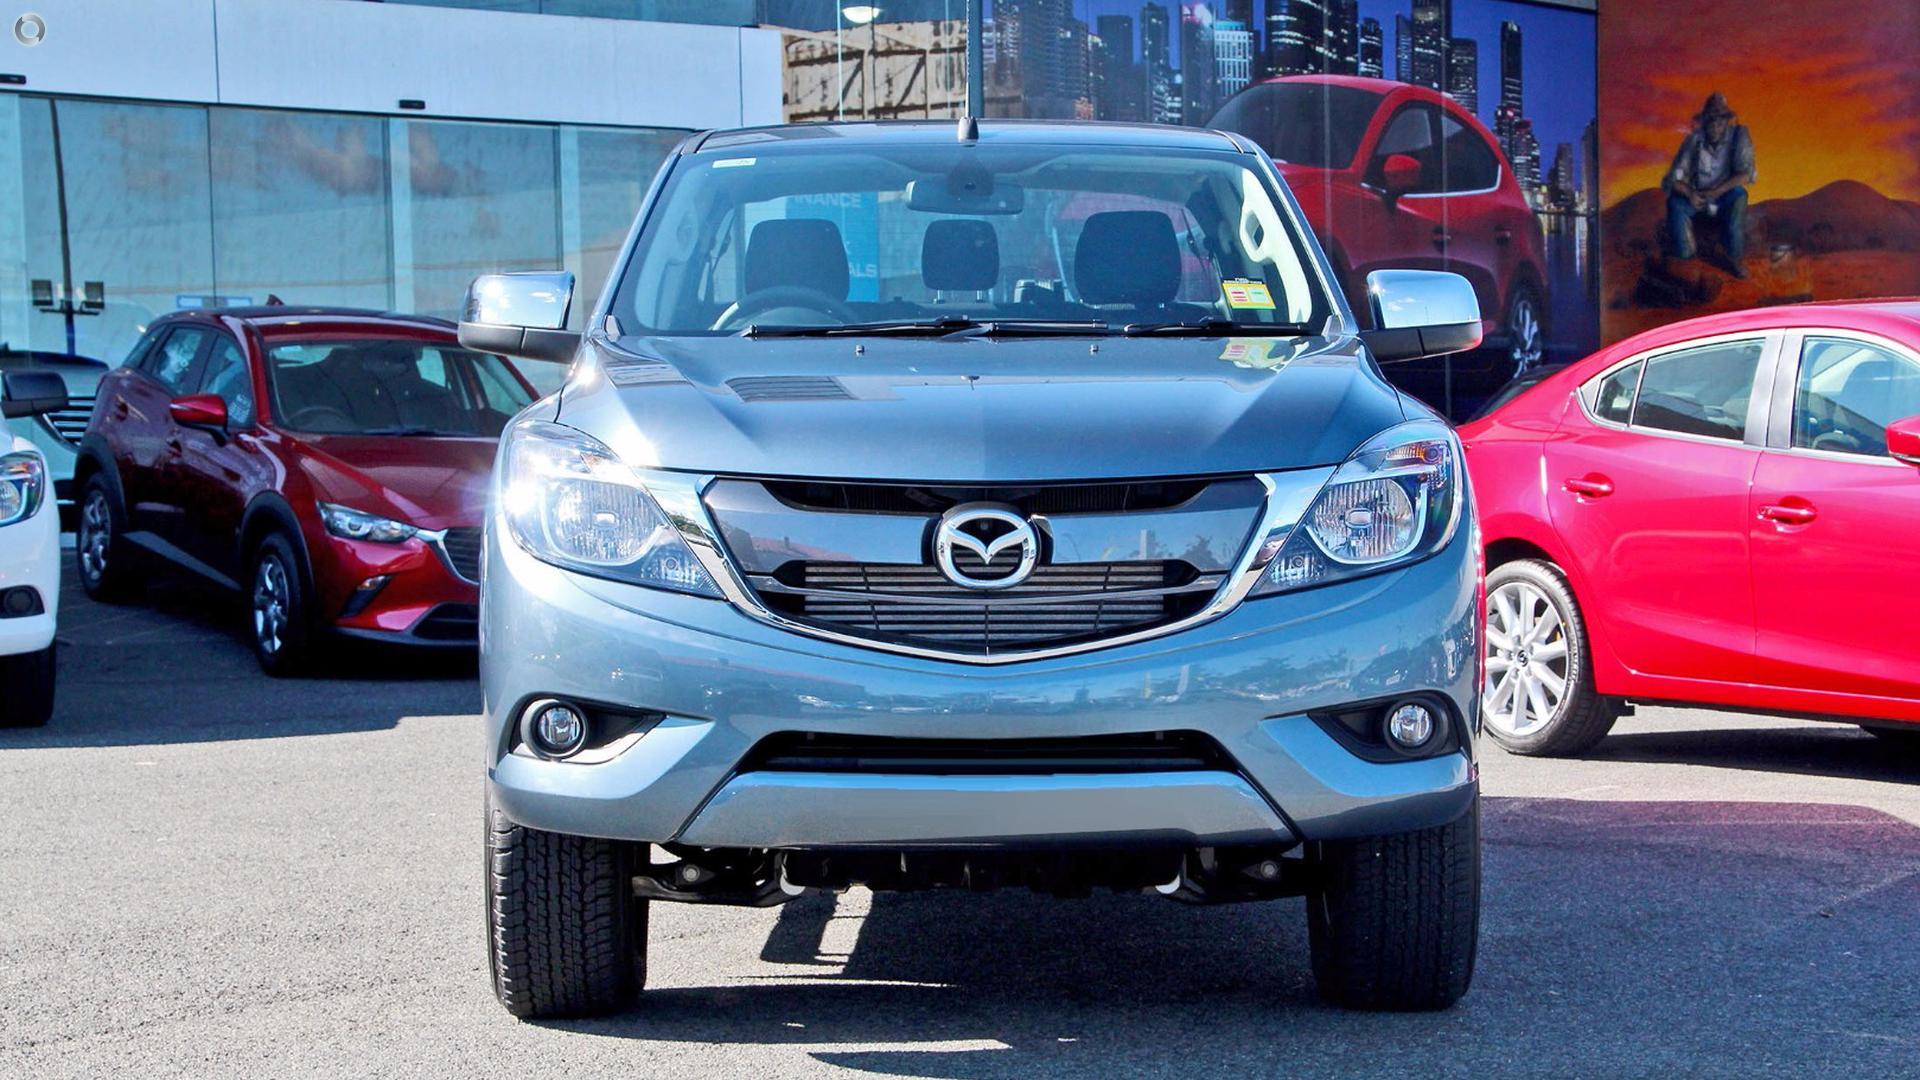 2017 Mazda Bt-50 UR